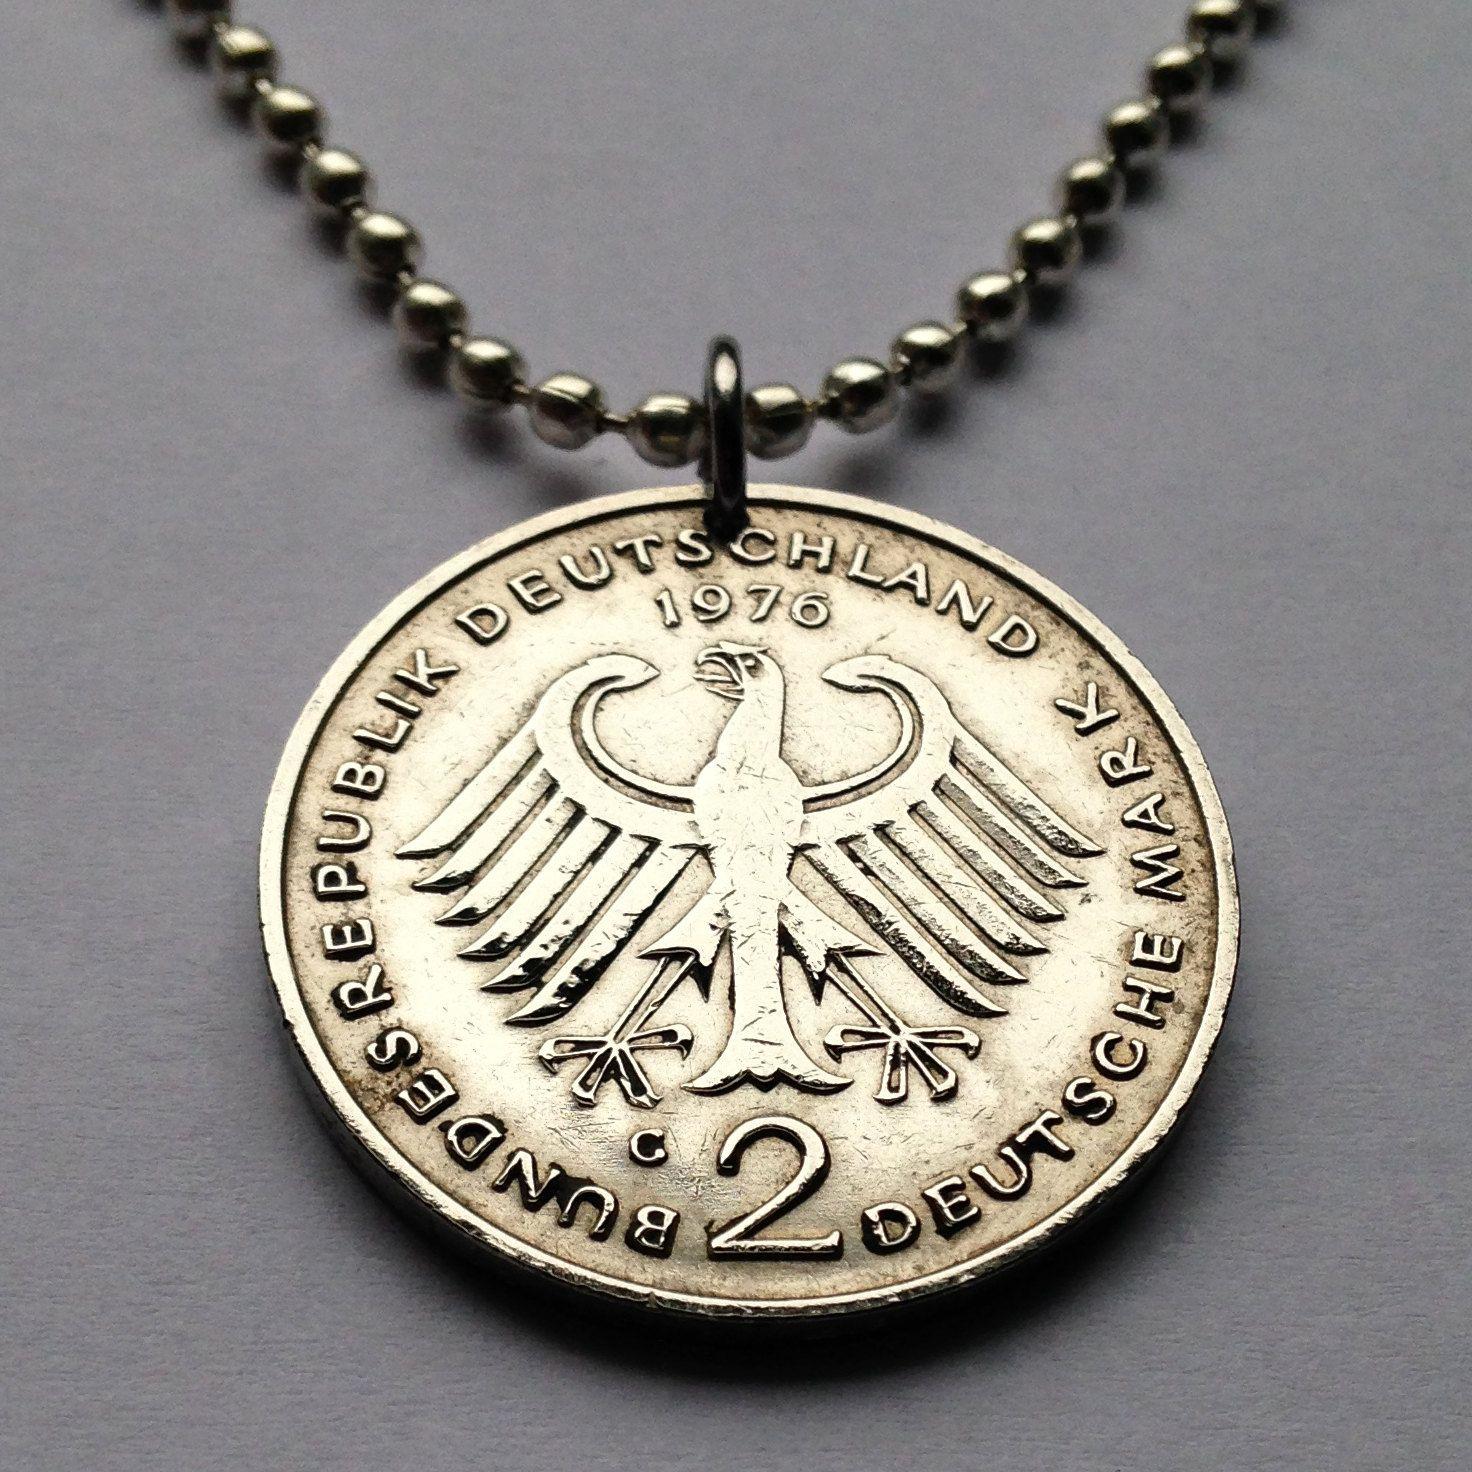 1976 germany 2 deutsche mark coin pendant german eagle necklace 1976 germany 2 deutsche mark coin pendant german eagle necklace escutcheon stuttgart coat of arms deutschland berlin bavaria hamburg by coinedjewelry on mozeypictures Images